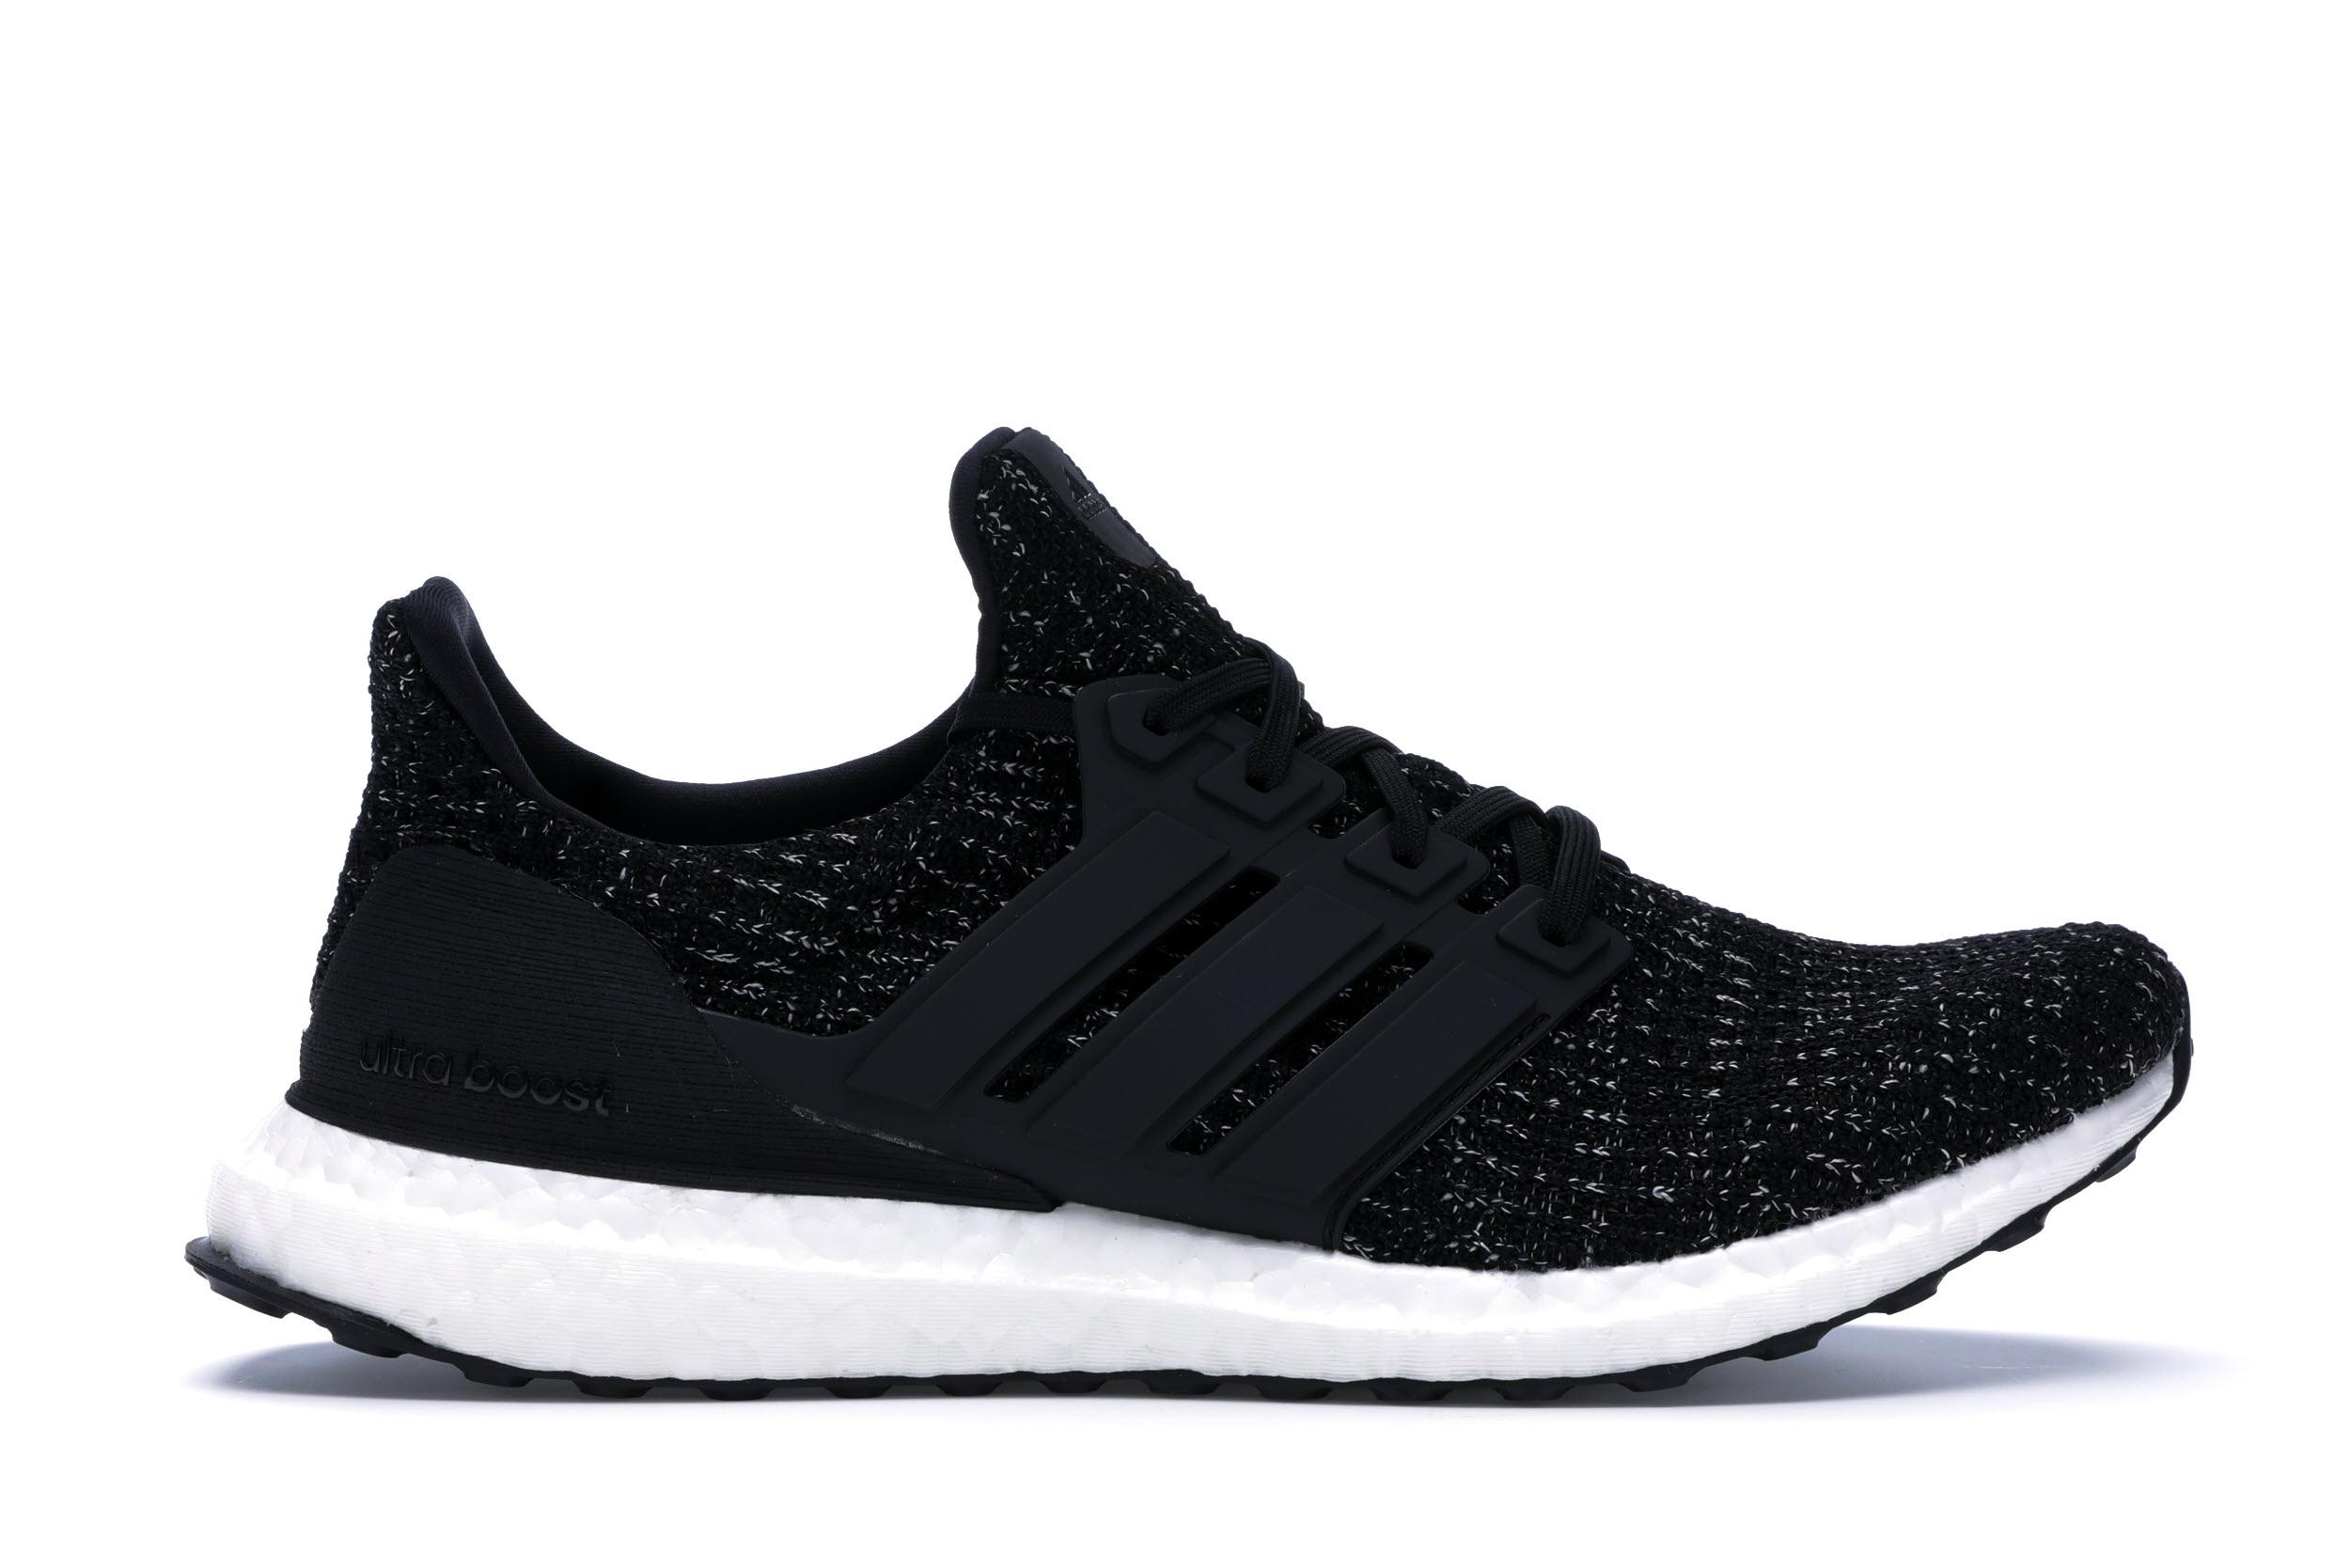 adidas boost noir et blanc